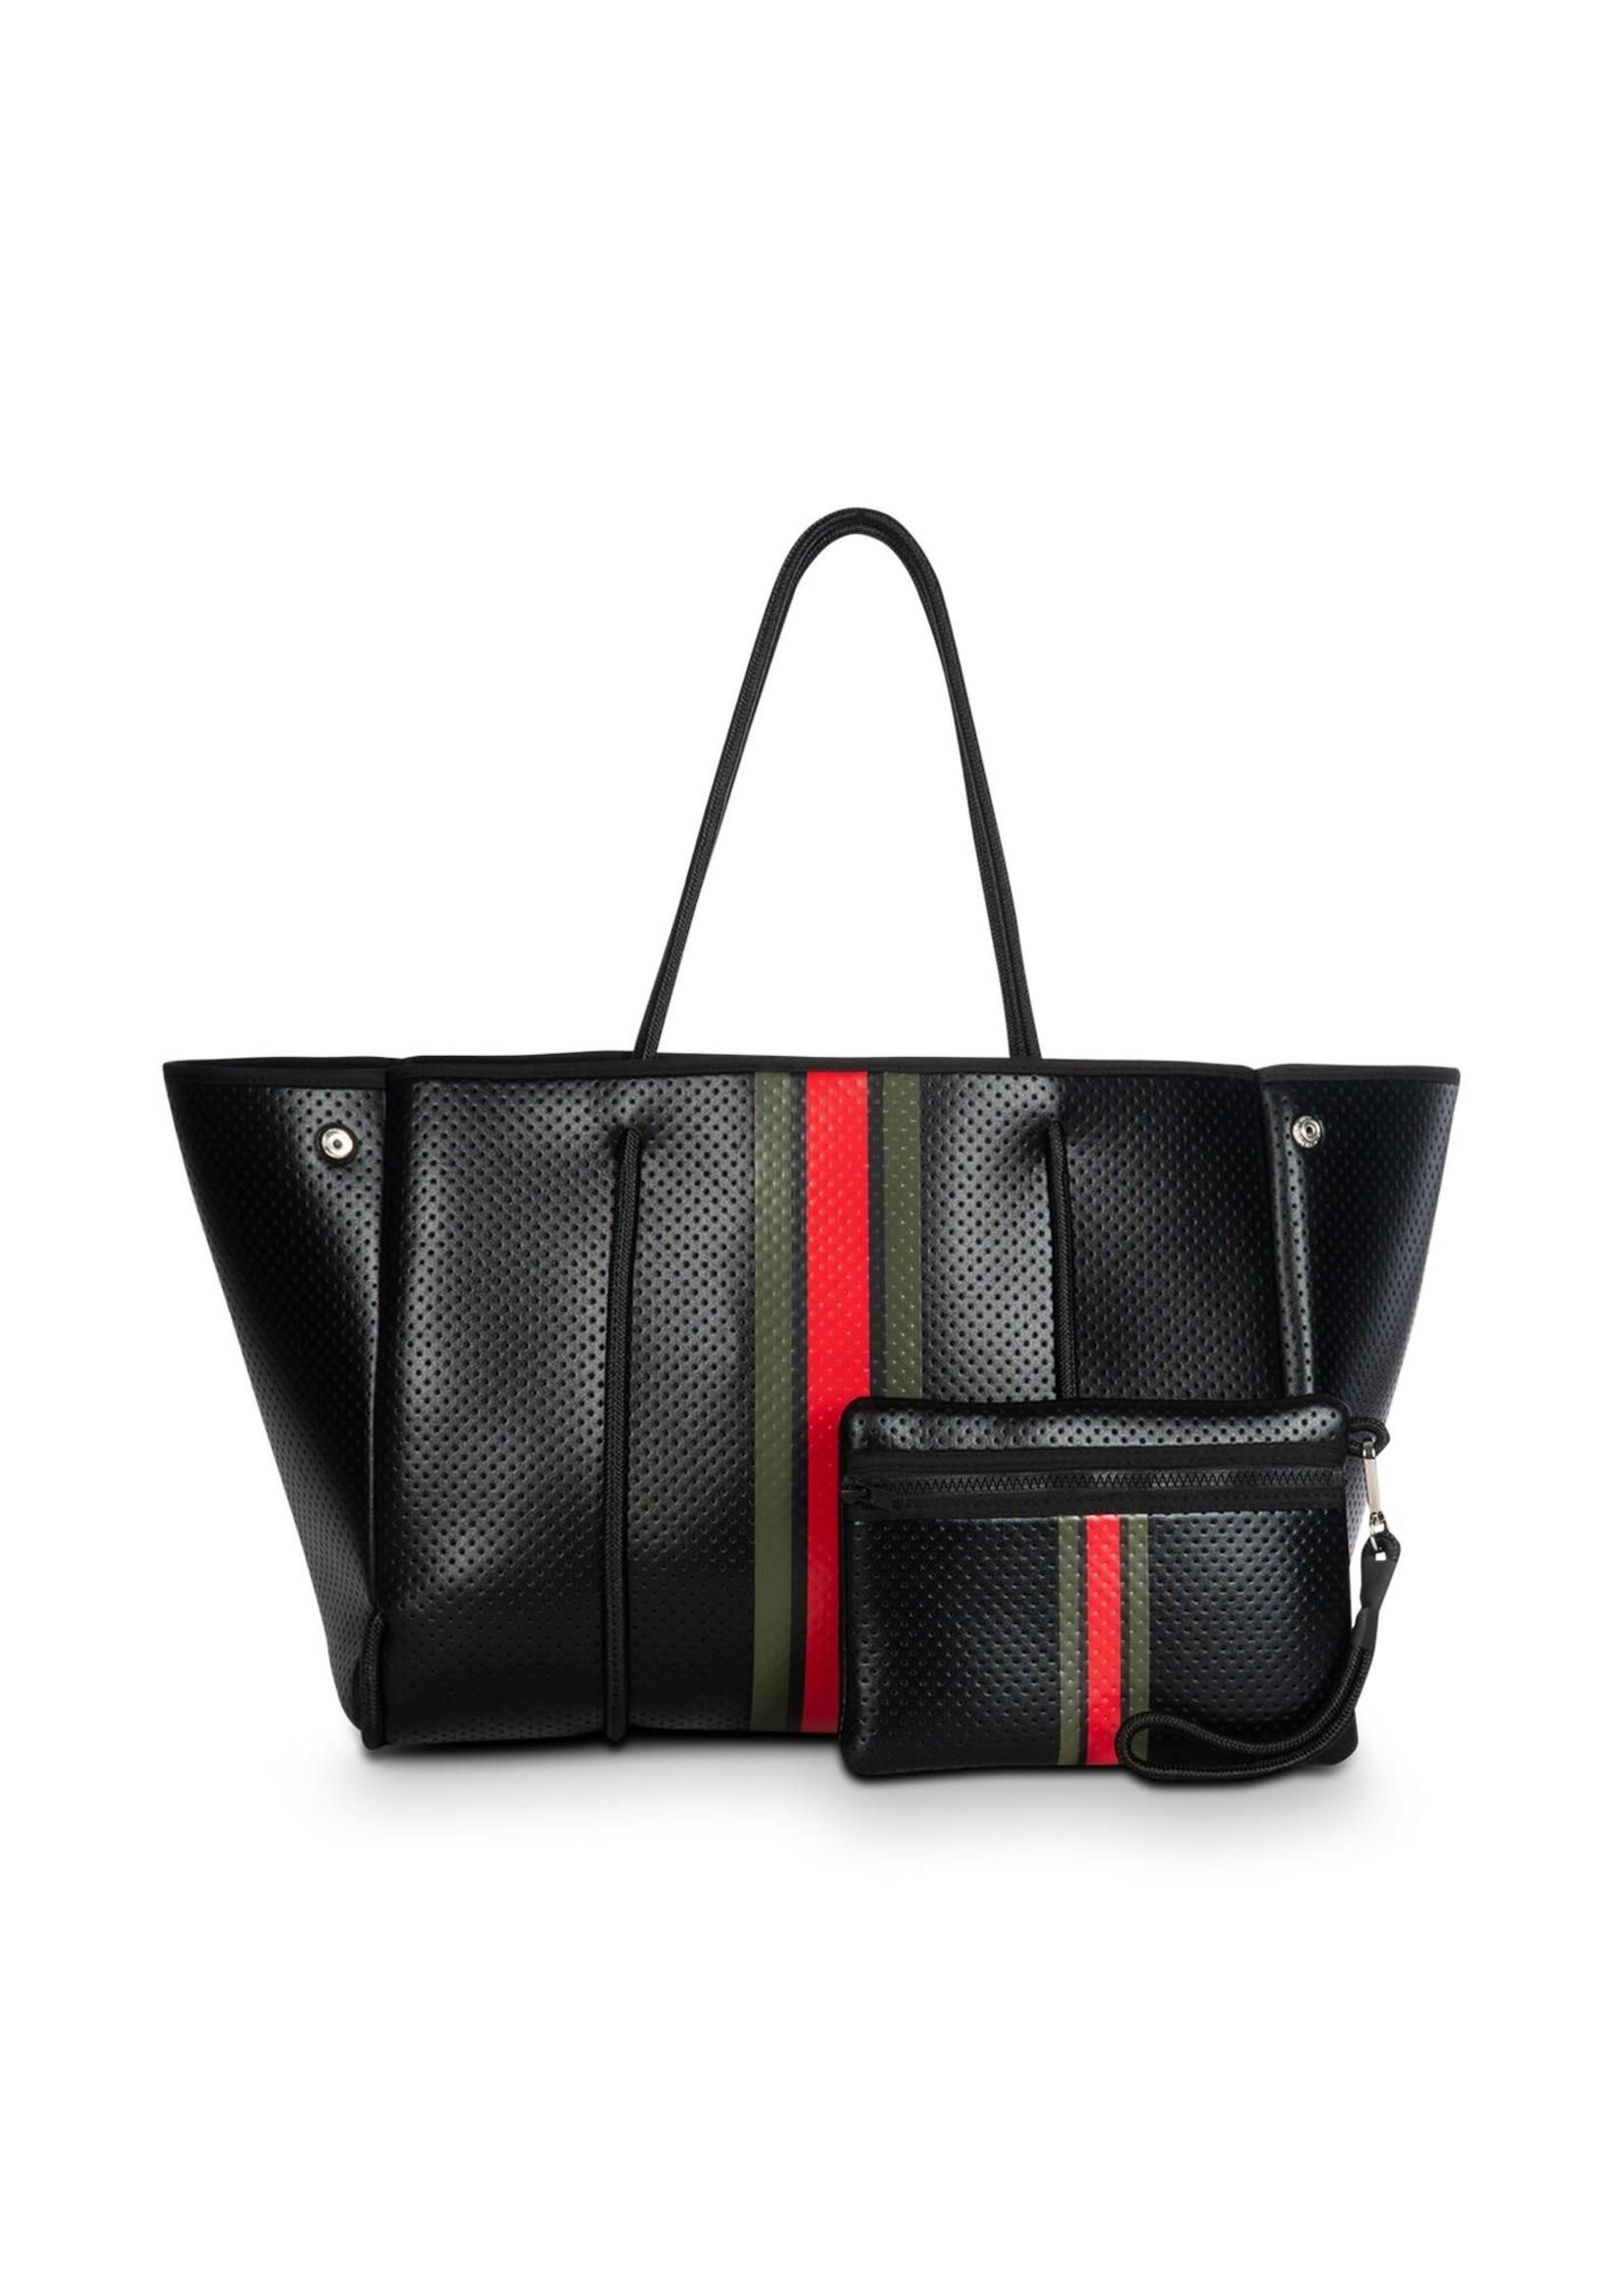 Greyson Breeze Hand Bag Bello Black